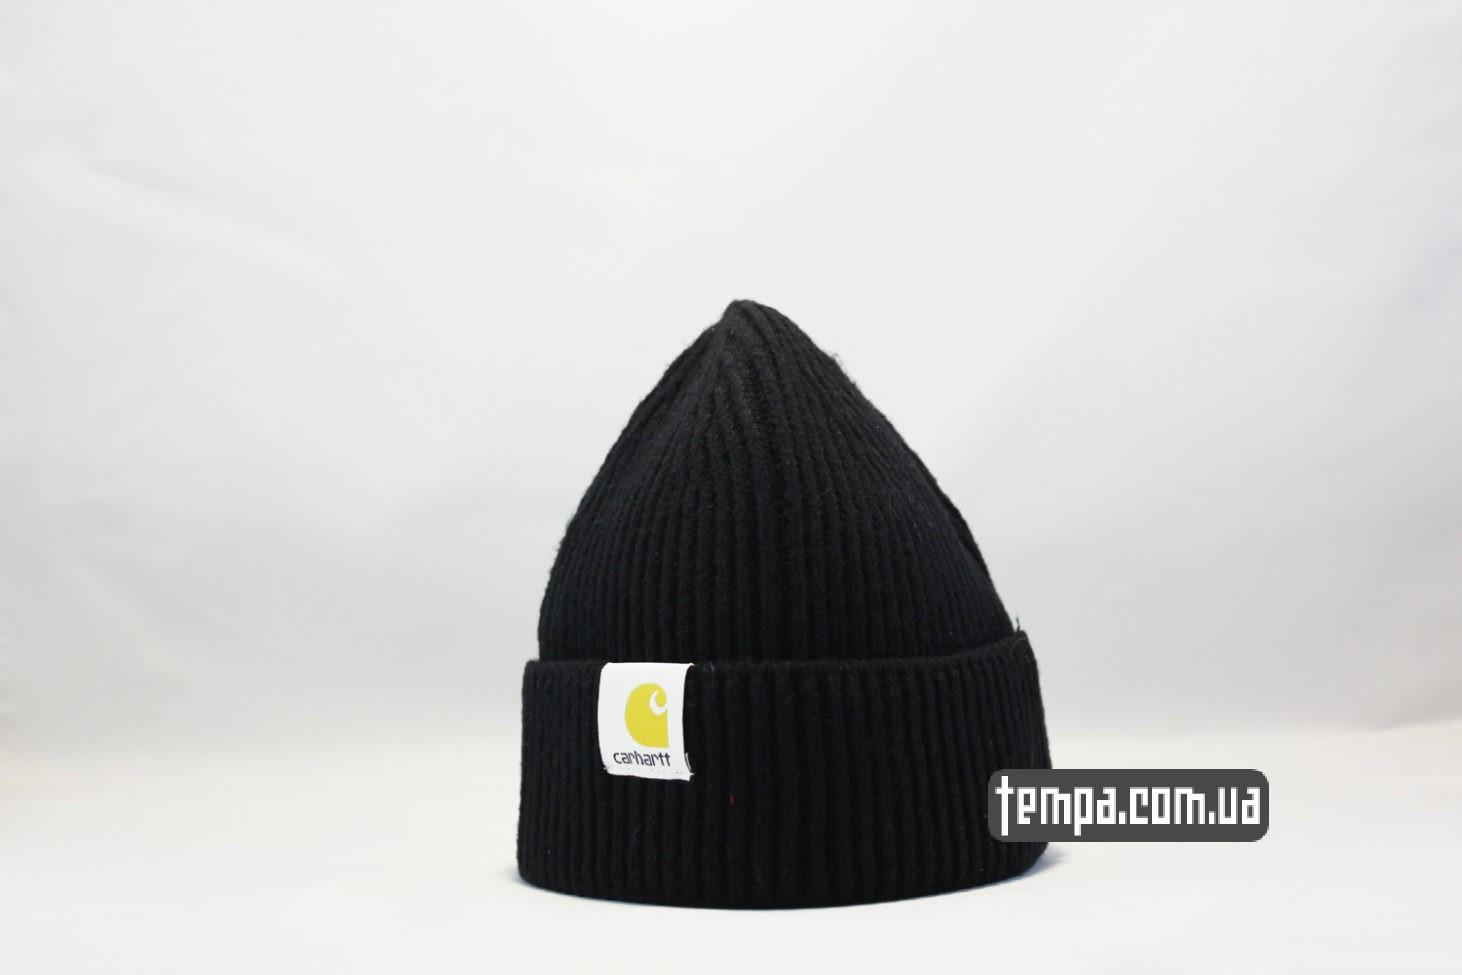 короткая шапка beanie Carhartt черная купить Украина